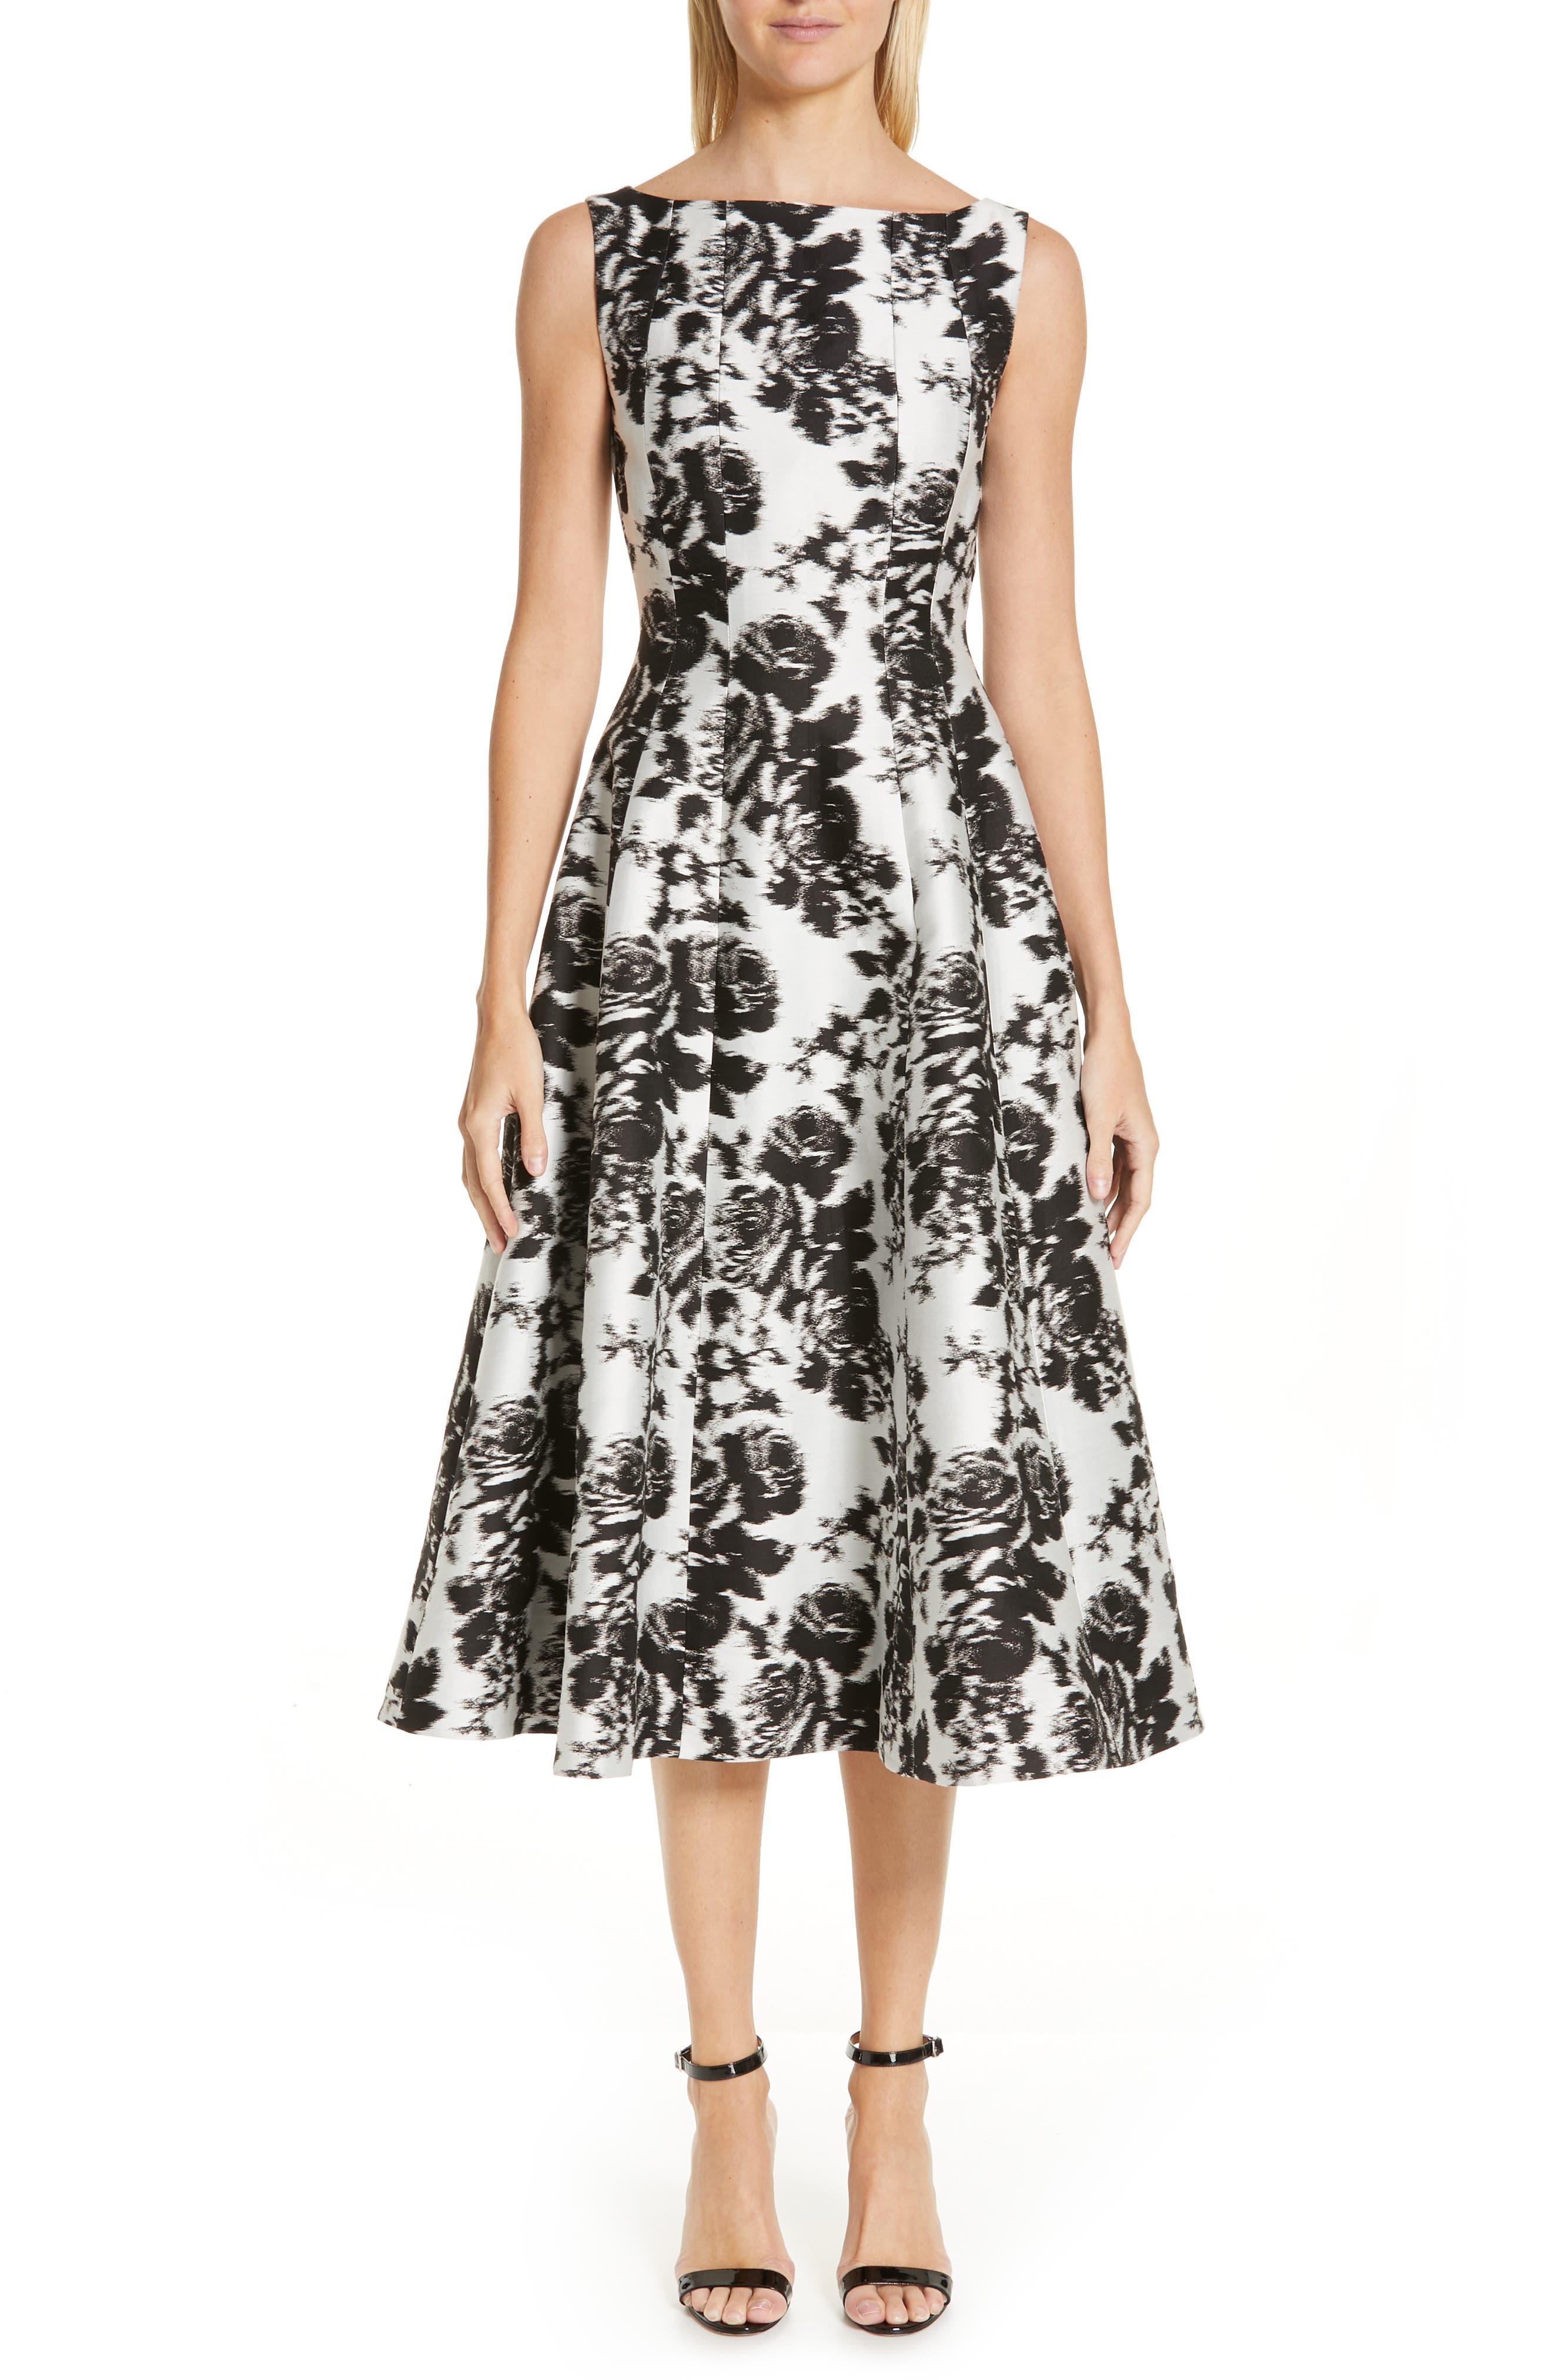 Erdem Rose Jacquard A-Line Dress, US / 10 UK - White